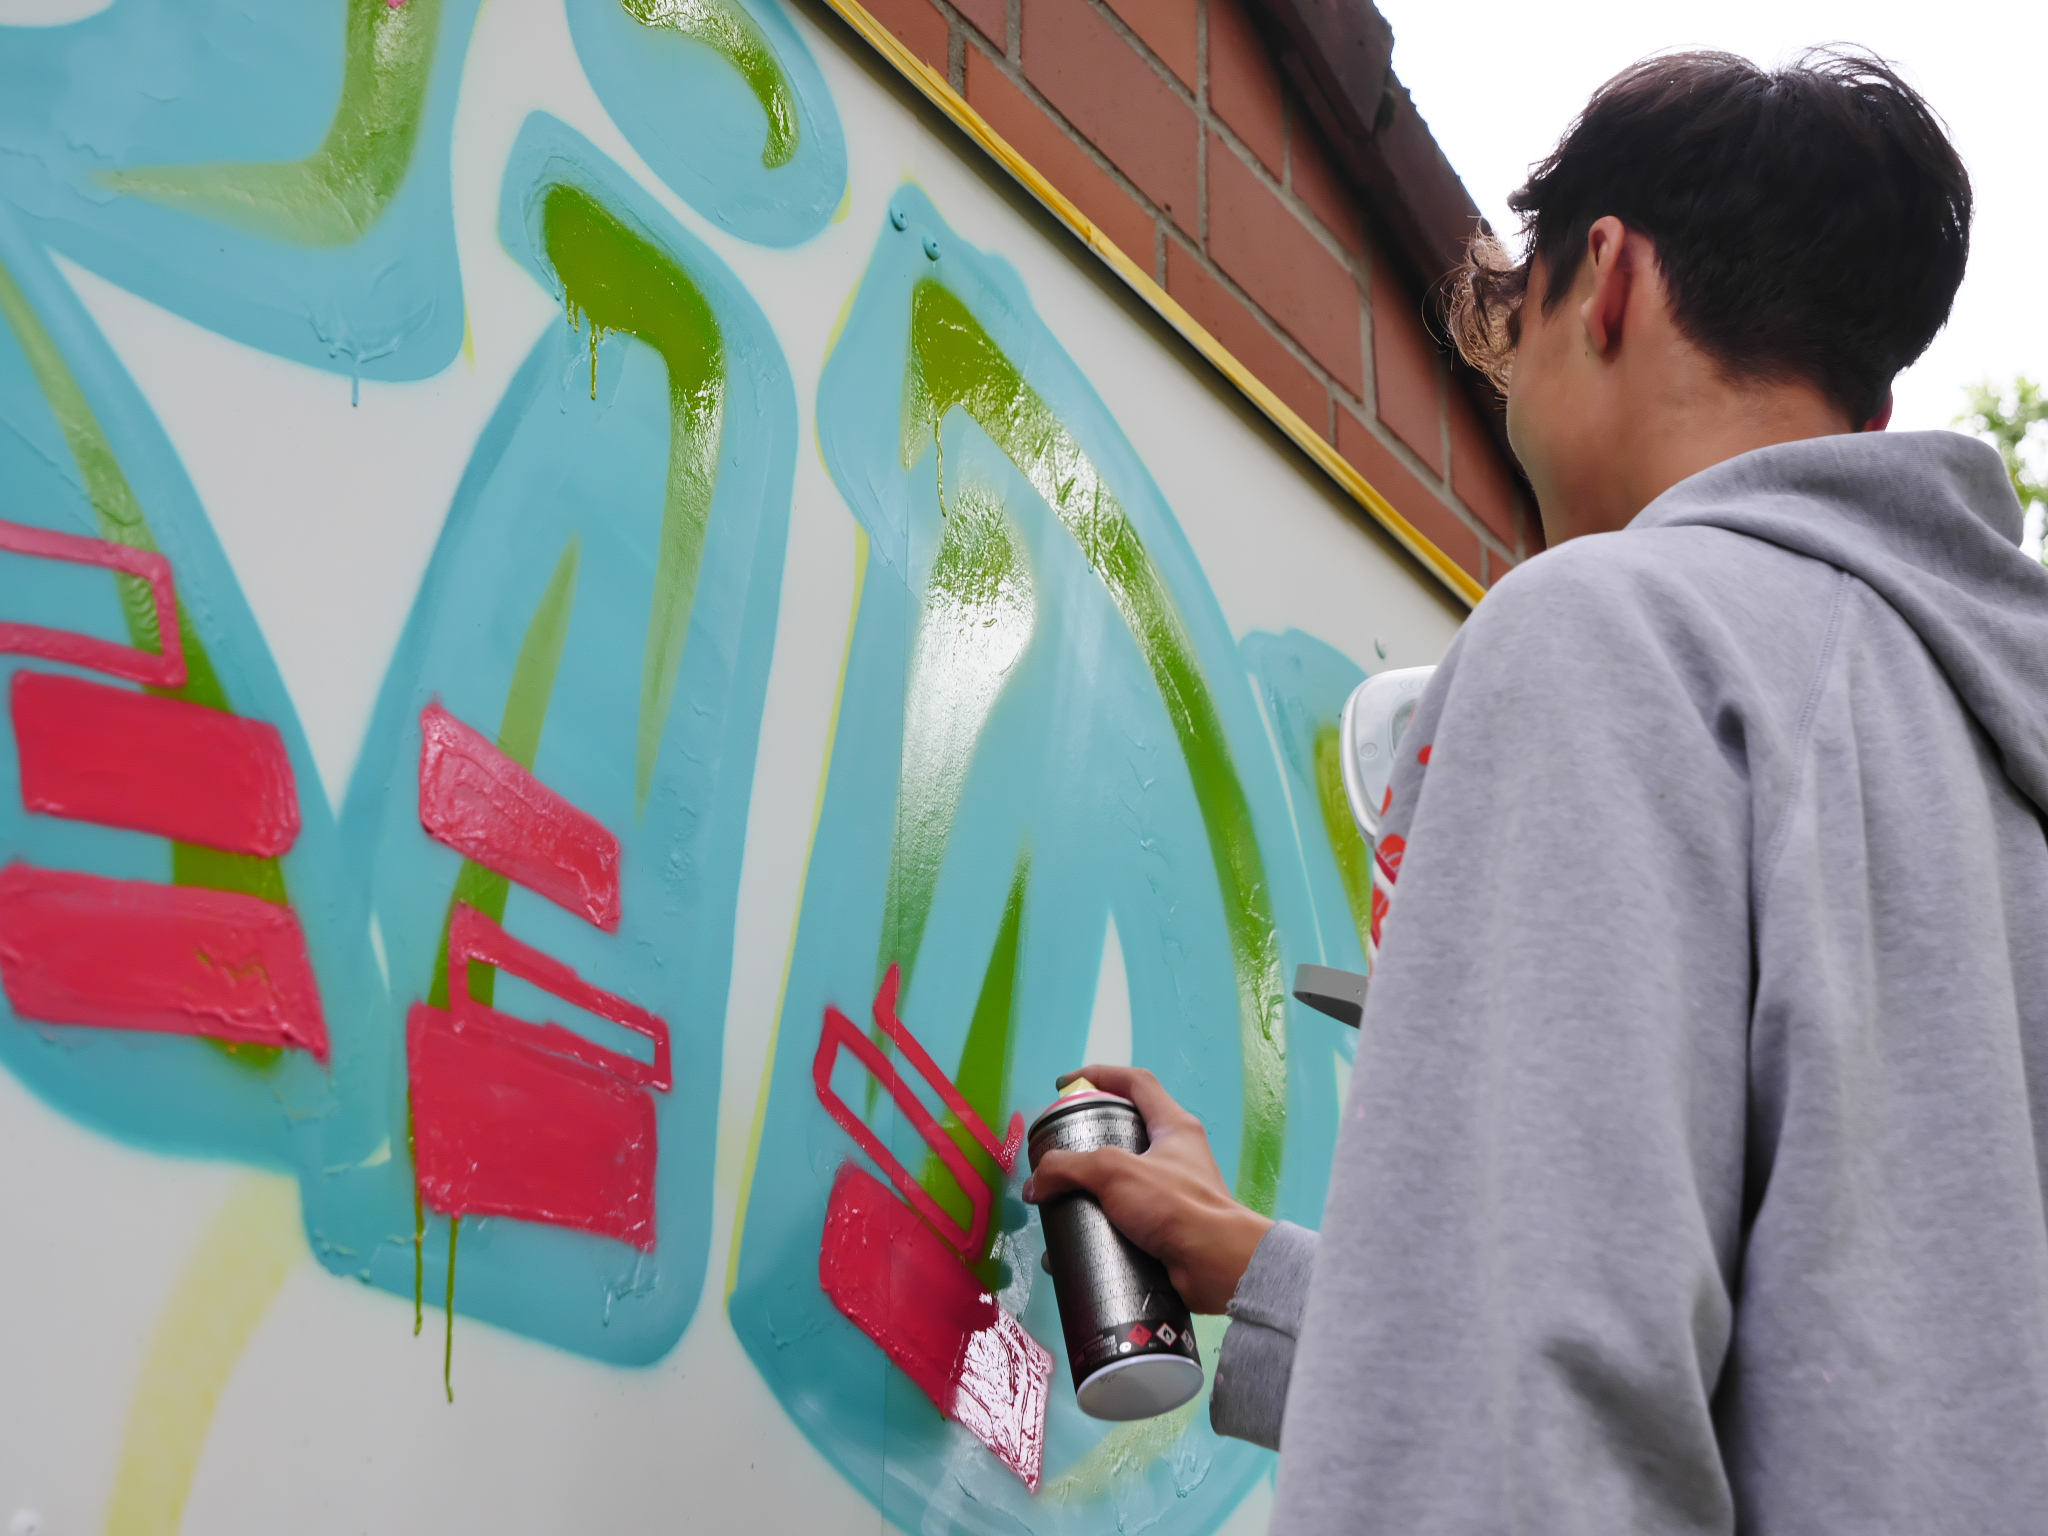 jugendkulturjahr-2020-ratingen-jkj2020-Graffitiworksjop-Bild16